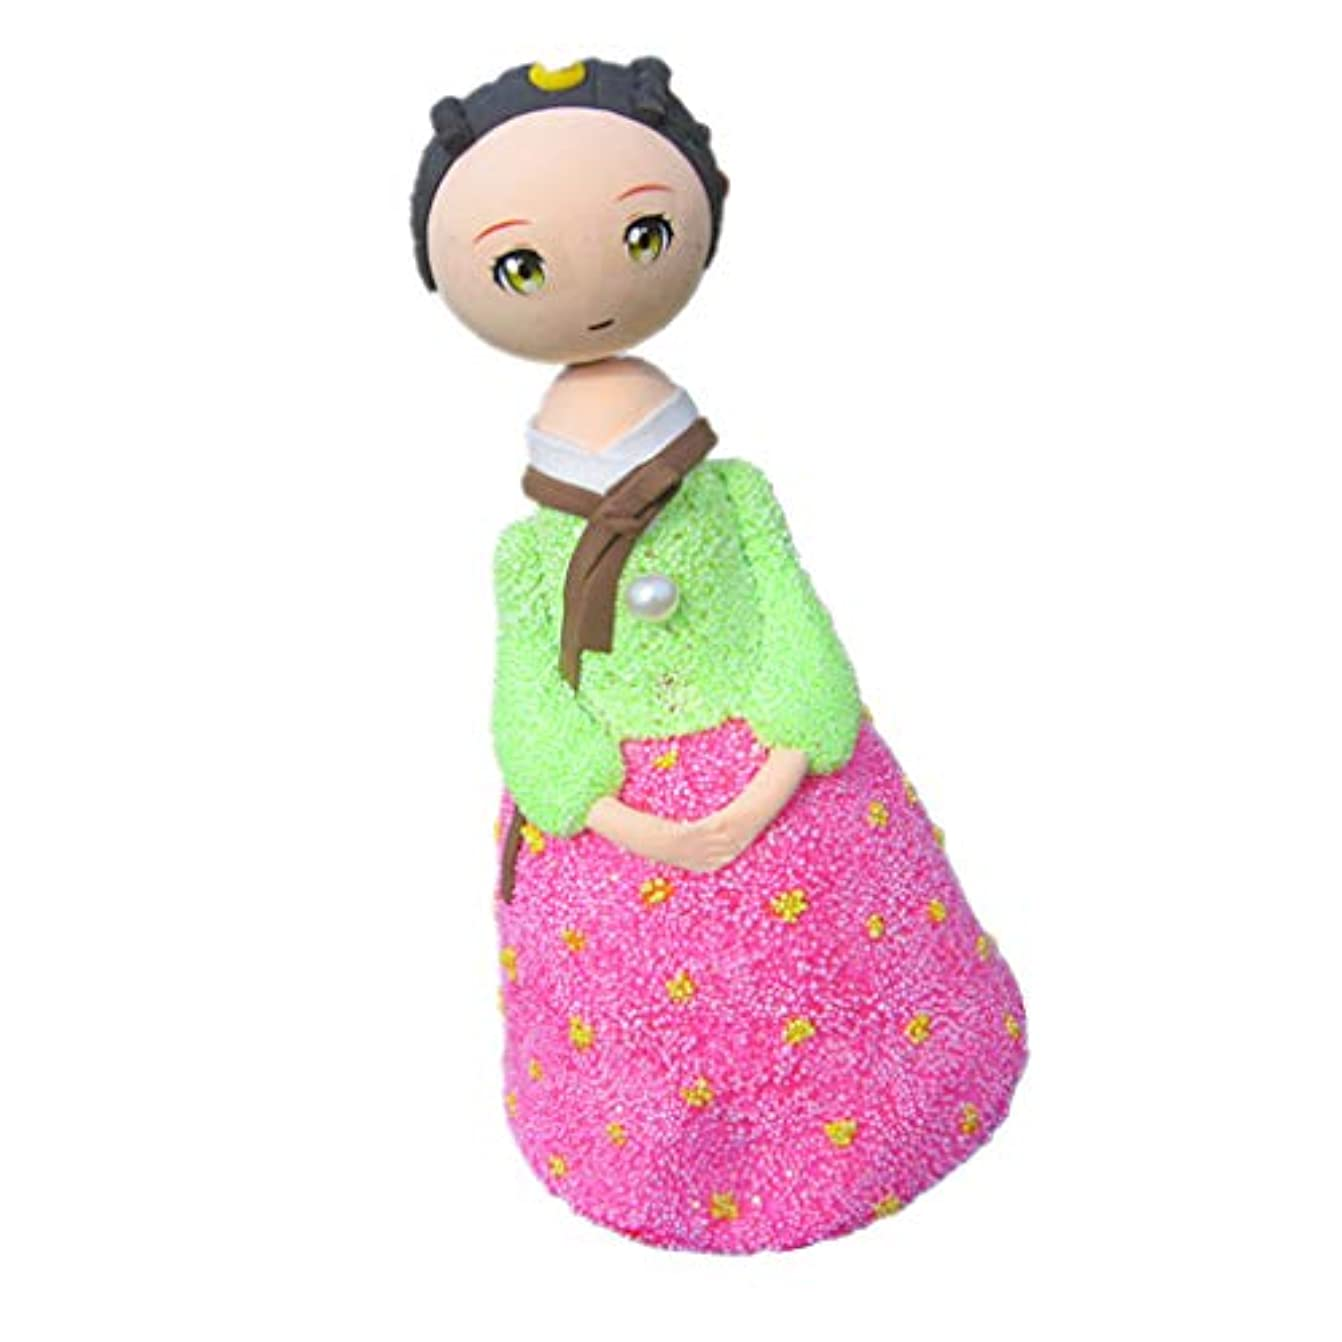 P Prettyia 子どもおもちゃ 手動 手作り 粘土人形 女の子人形 人形ドール 置き物 ねんど クレー 全3色 - #3